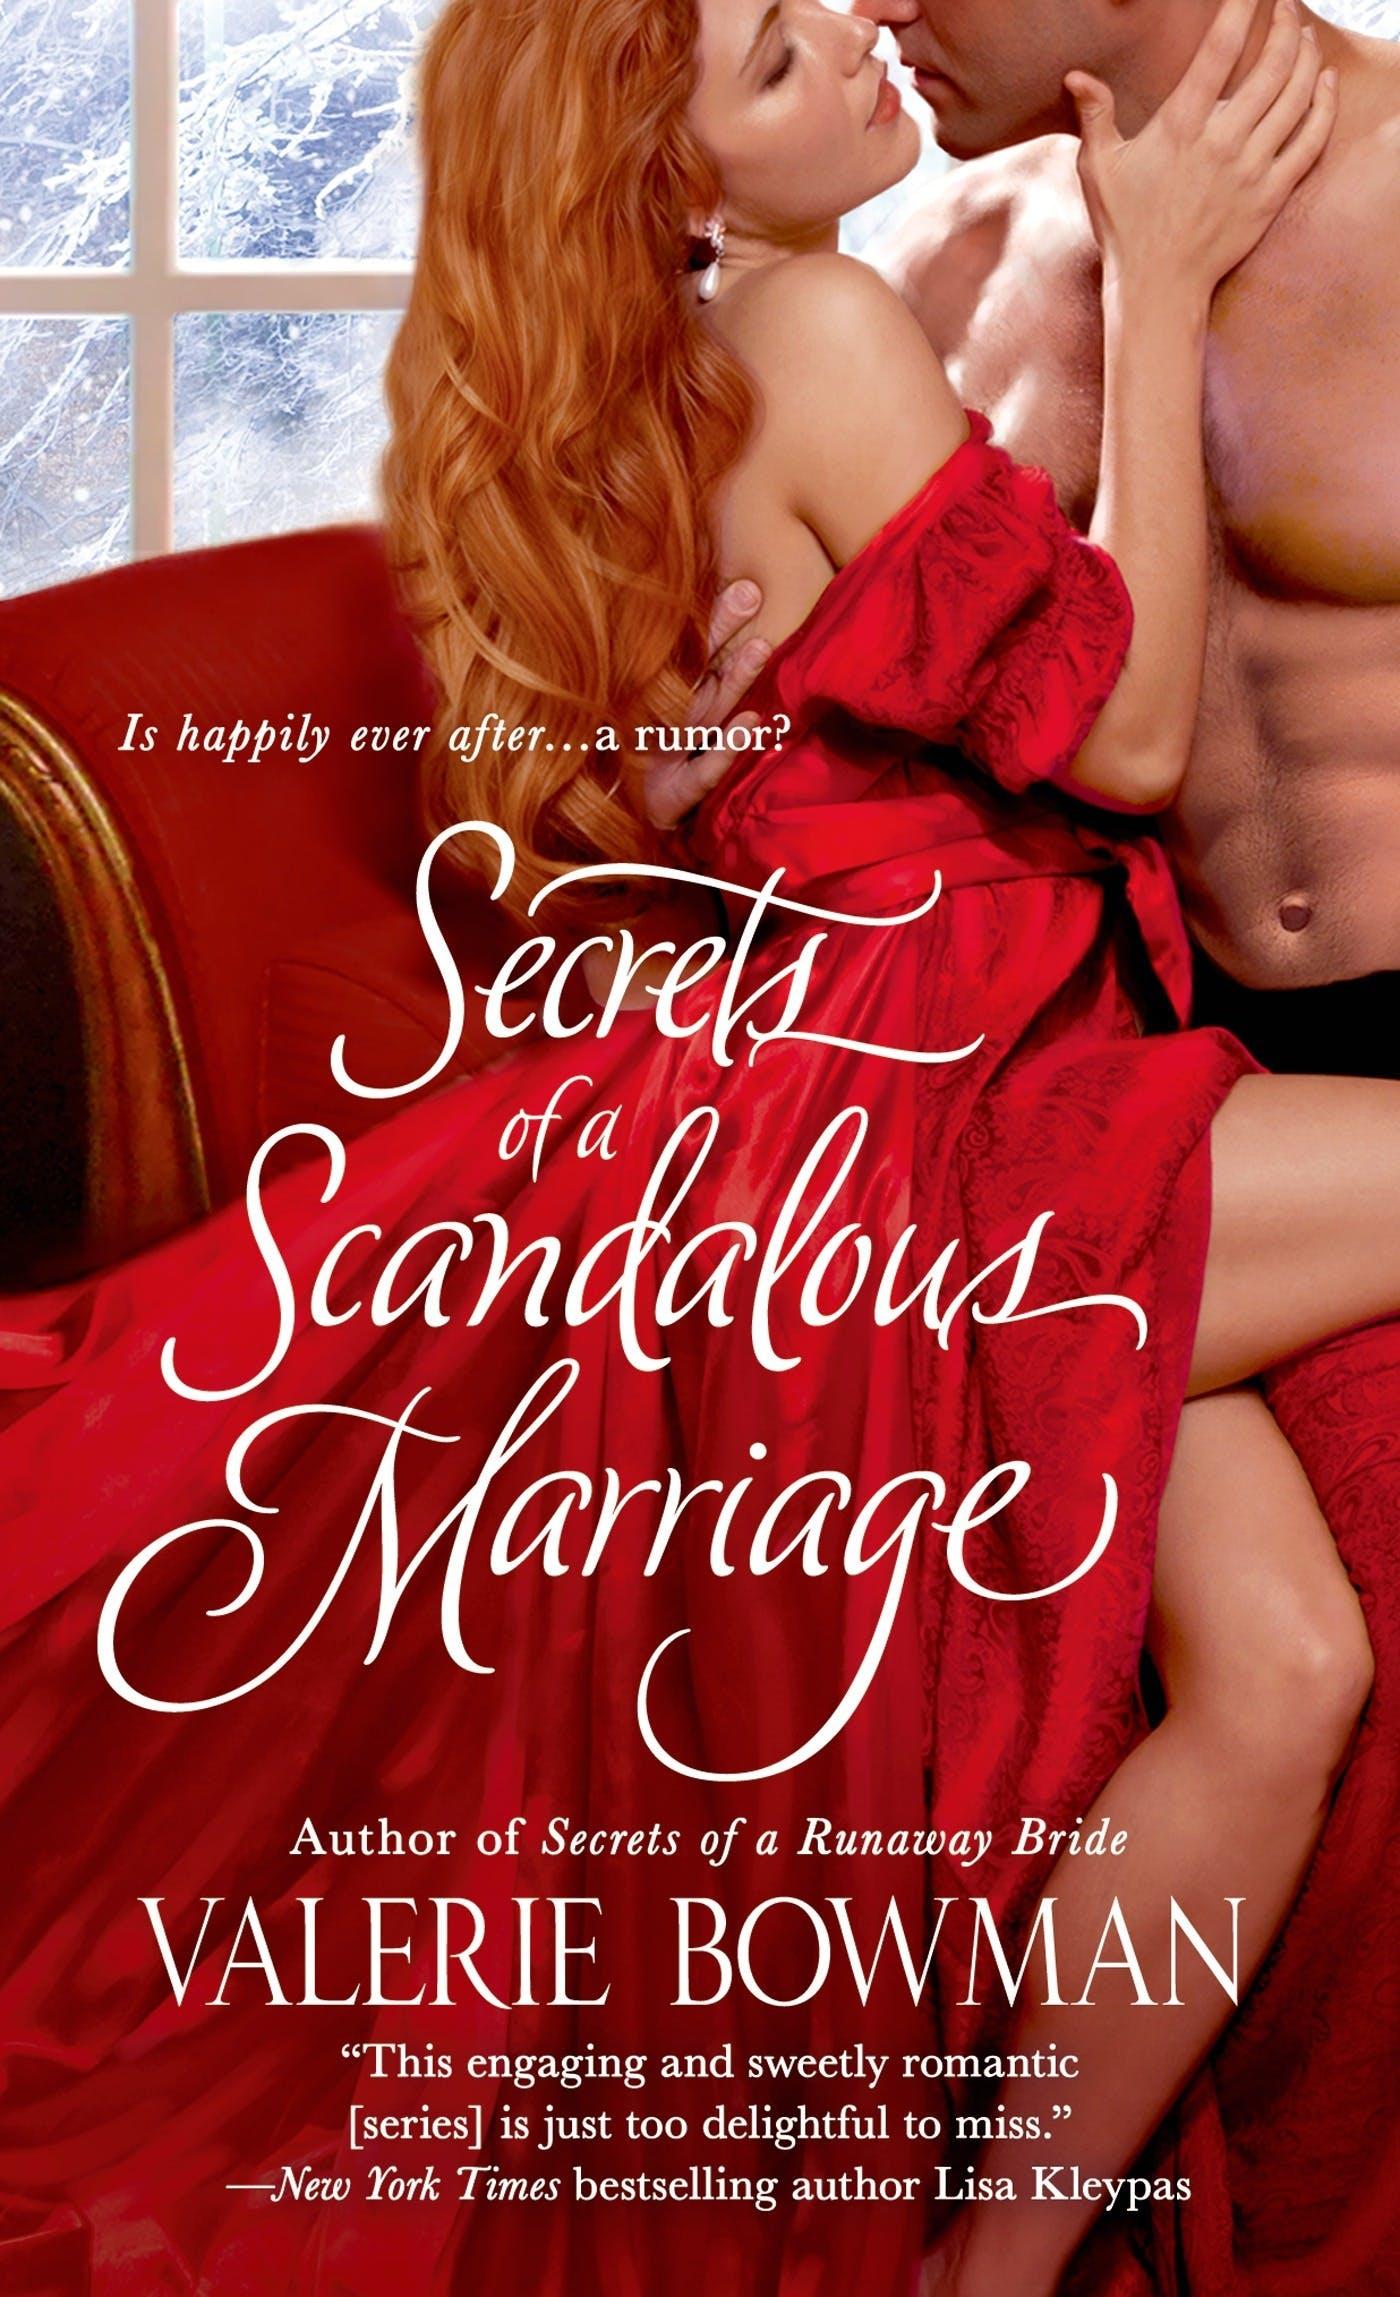 Image of Secrets of a Scandalous Marriage